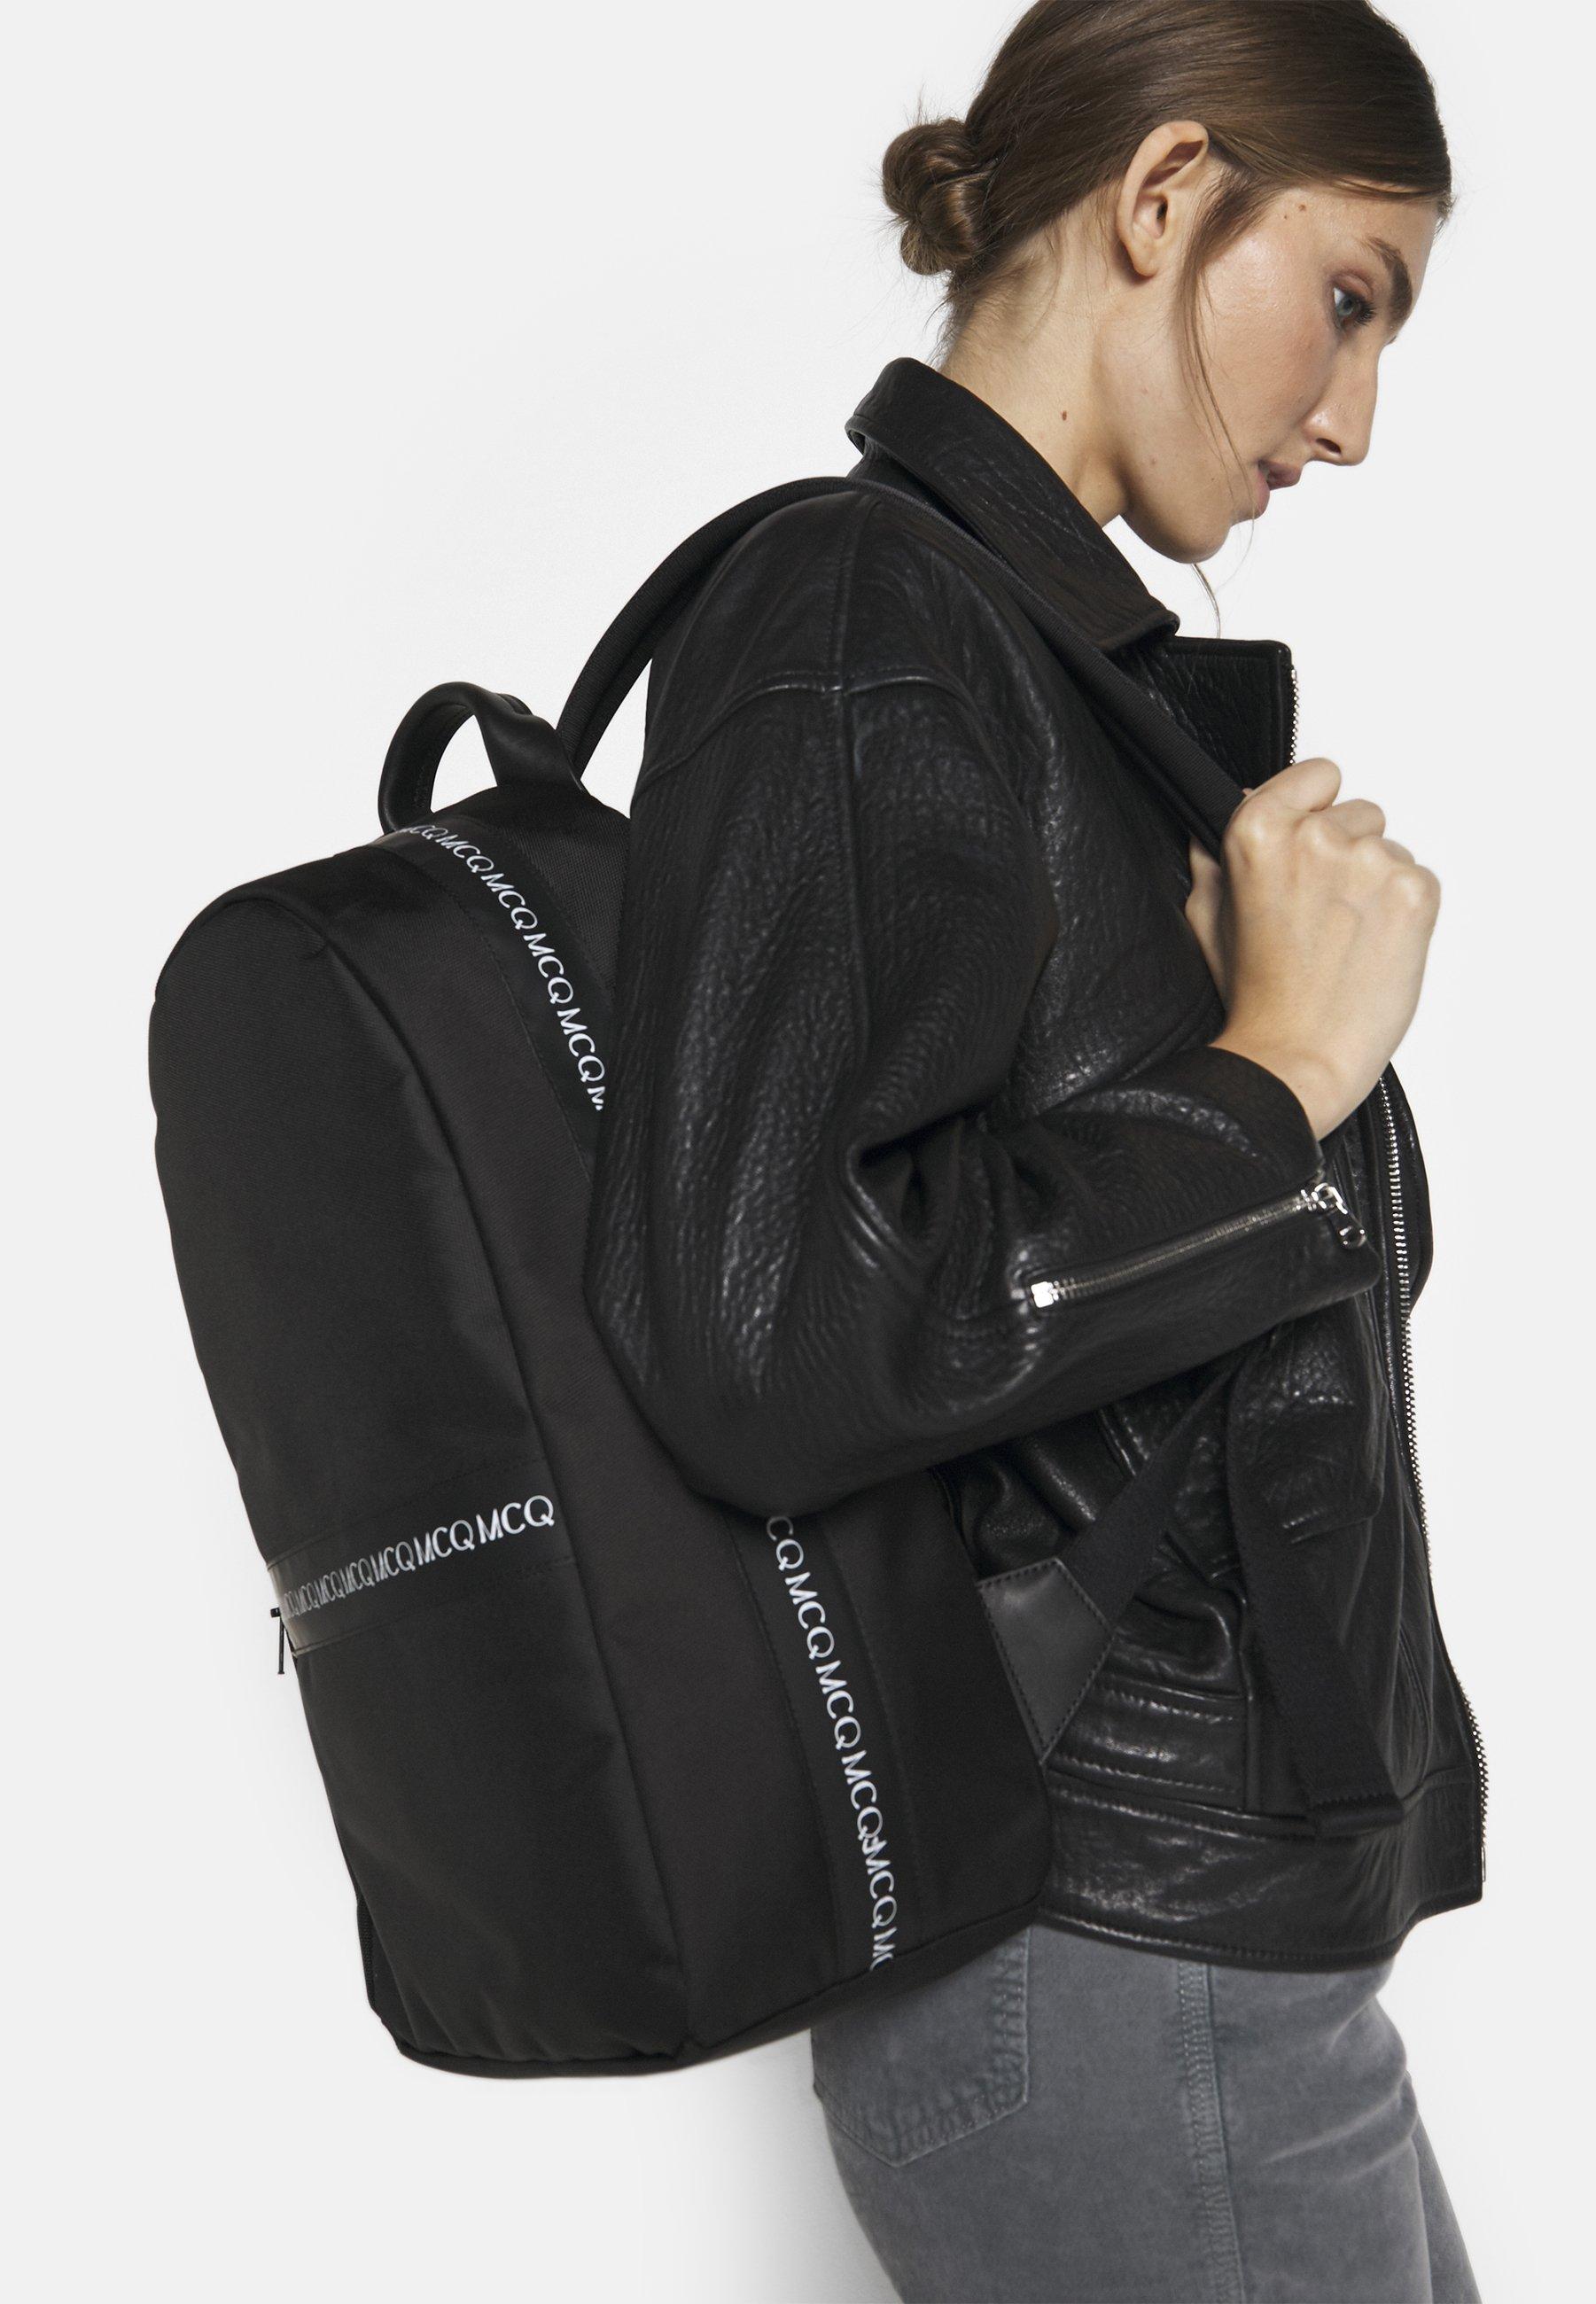 Outlet Outlet McQ Alexander McQueen CLASSIC BACKPACK - Rucksack - black   men's accessories 2020 skQJa